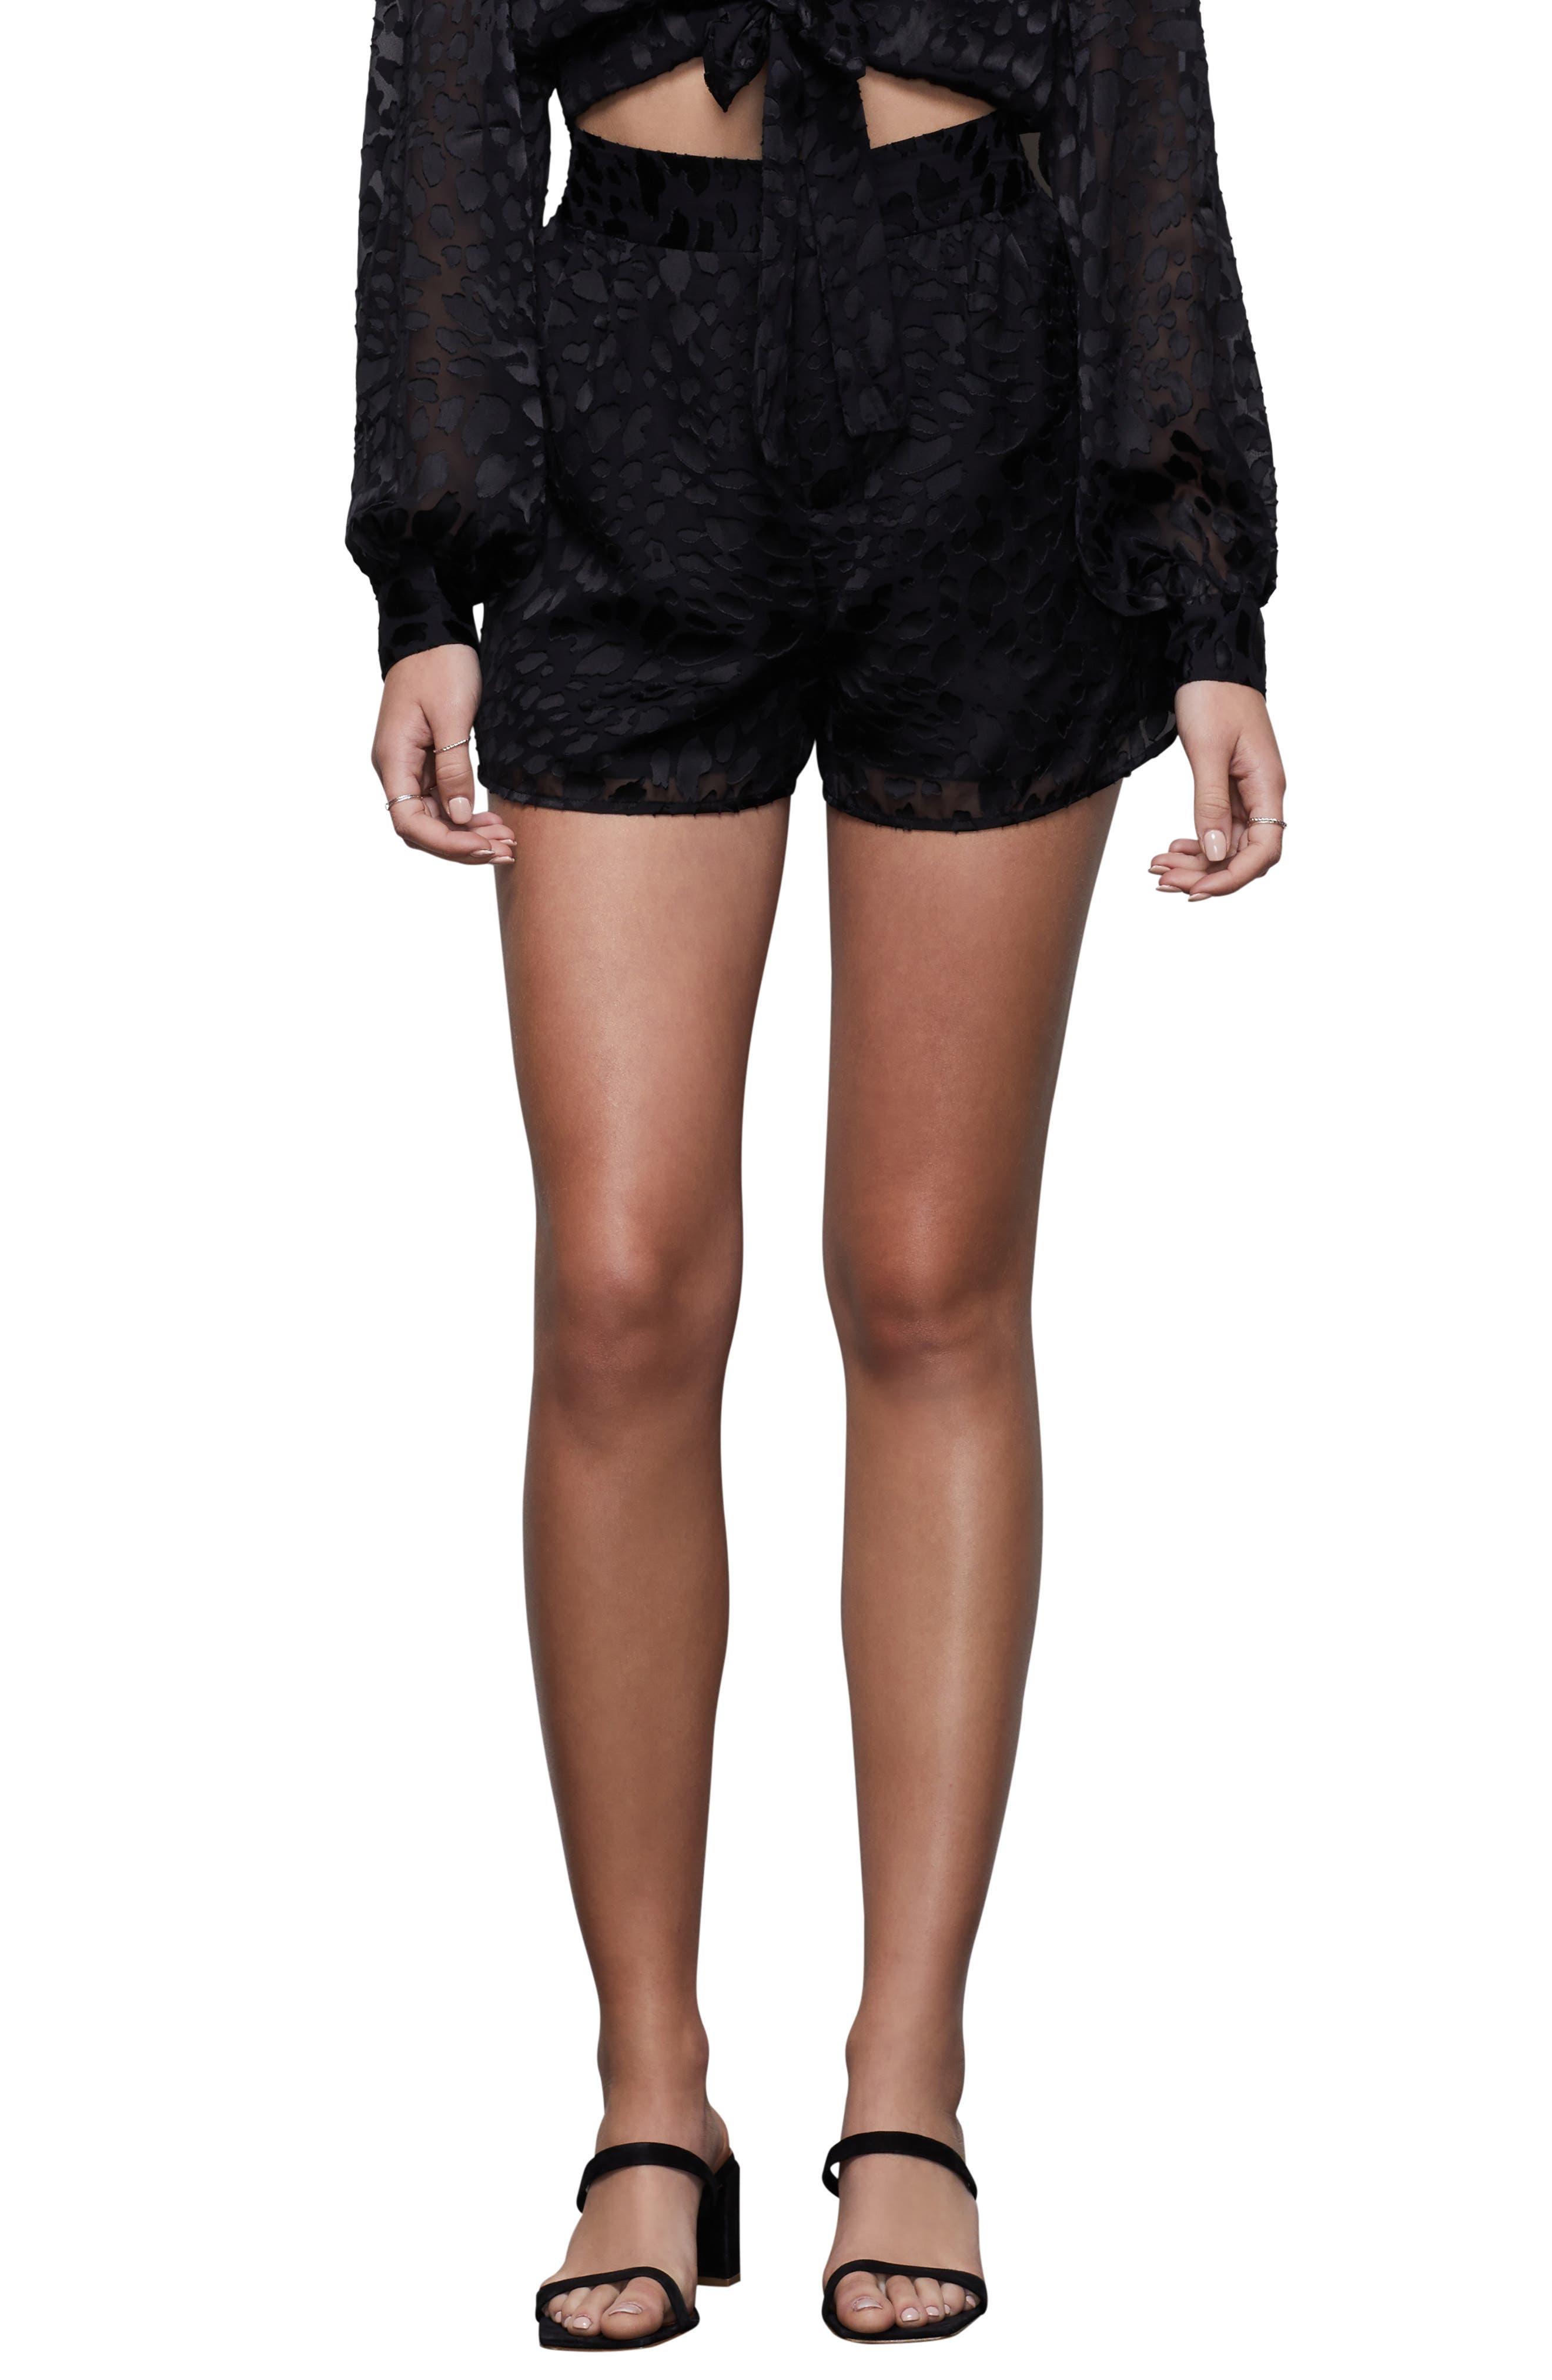 Plus  Women's Good American The Midnight Leopard Burnout Shorts,  4 (fits like 18-20US / 14-16W) - Black